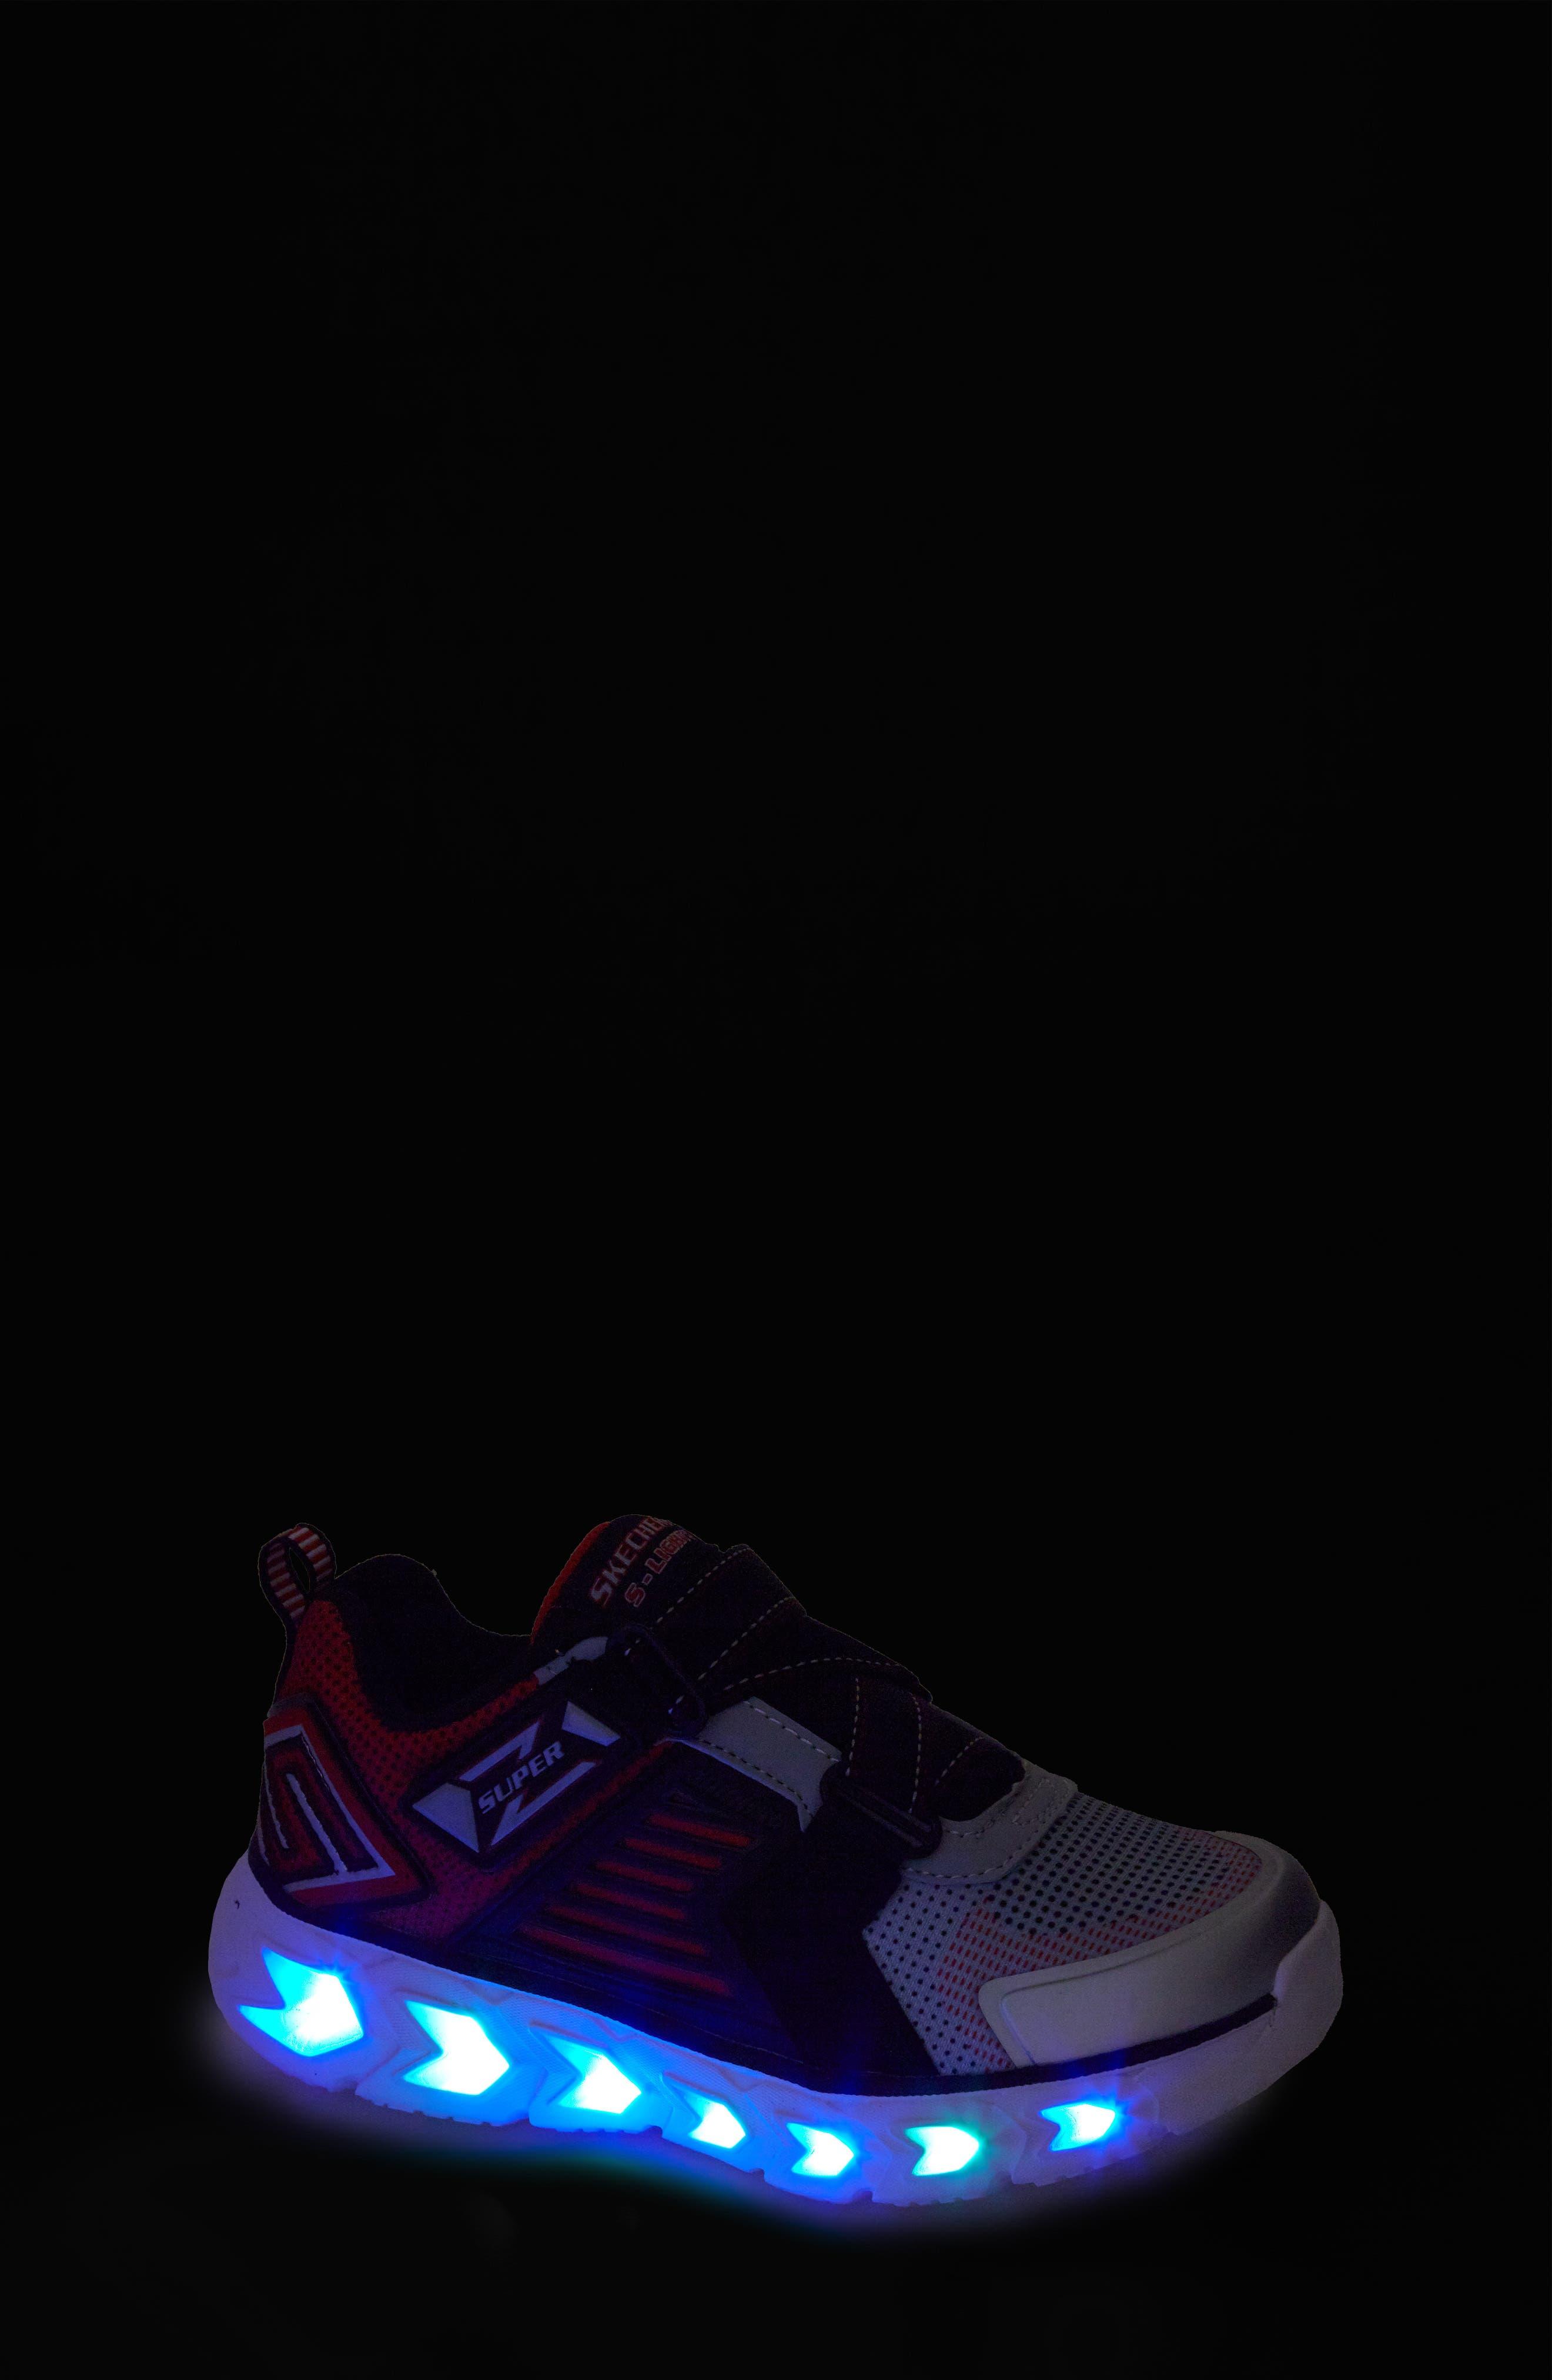 Hypno-Flash 2.0 Rapid Quake Sneakers,                             Alternate thumbnail 7, color,